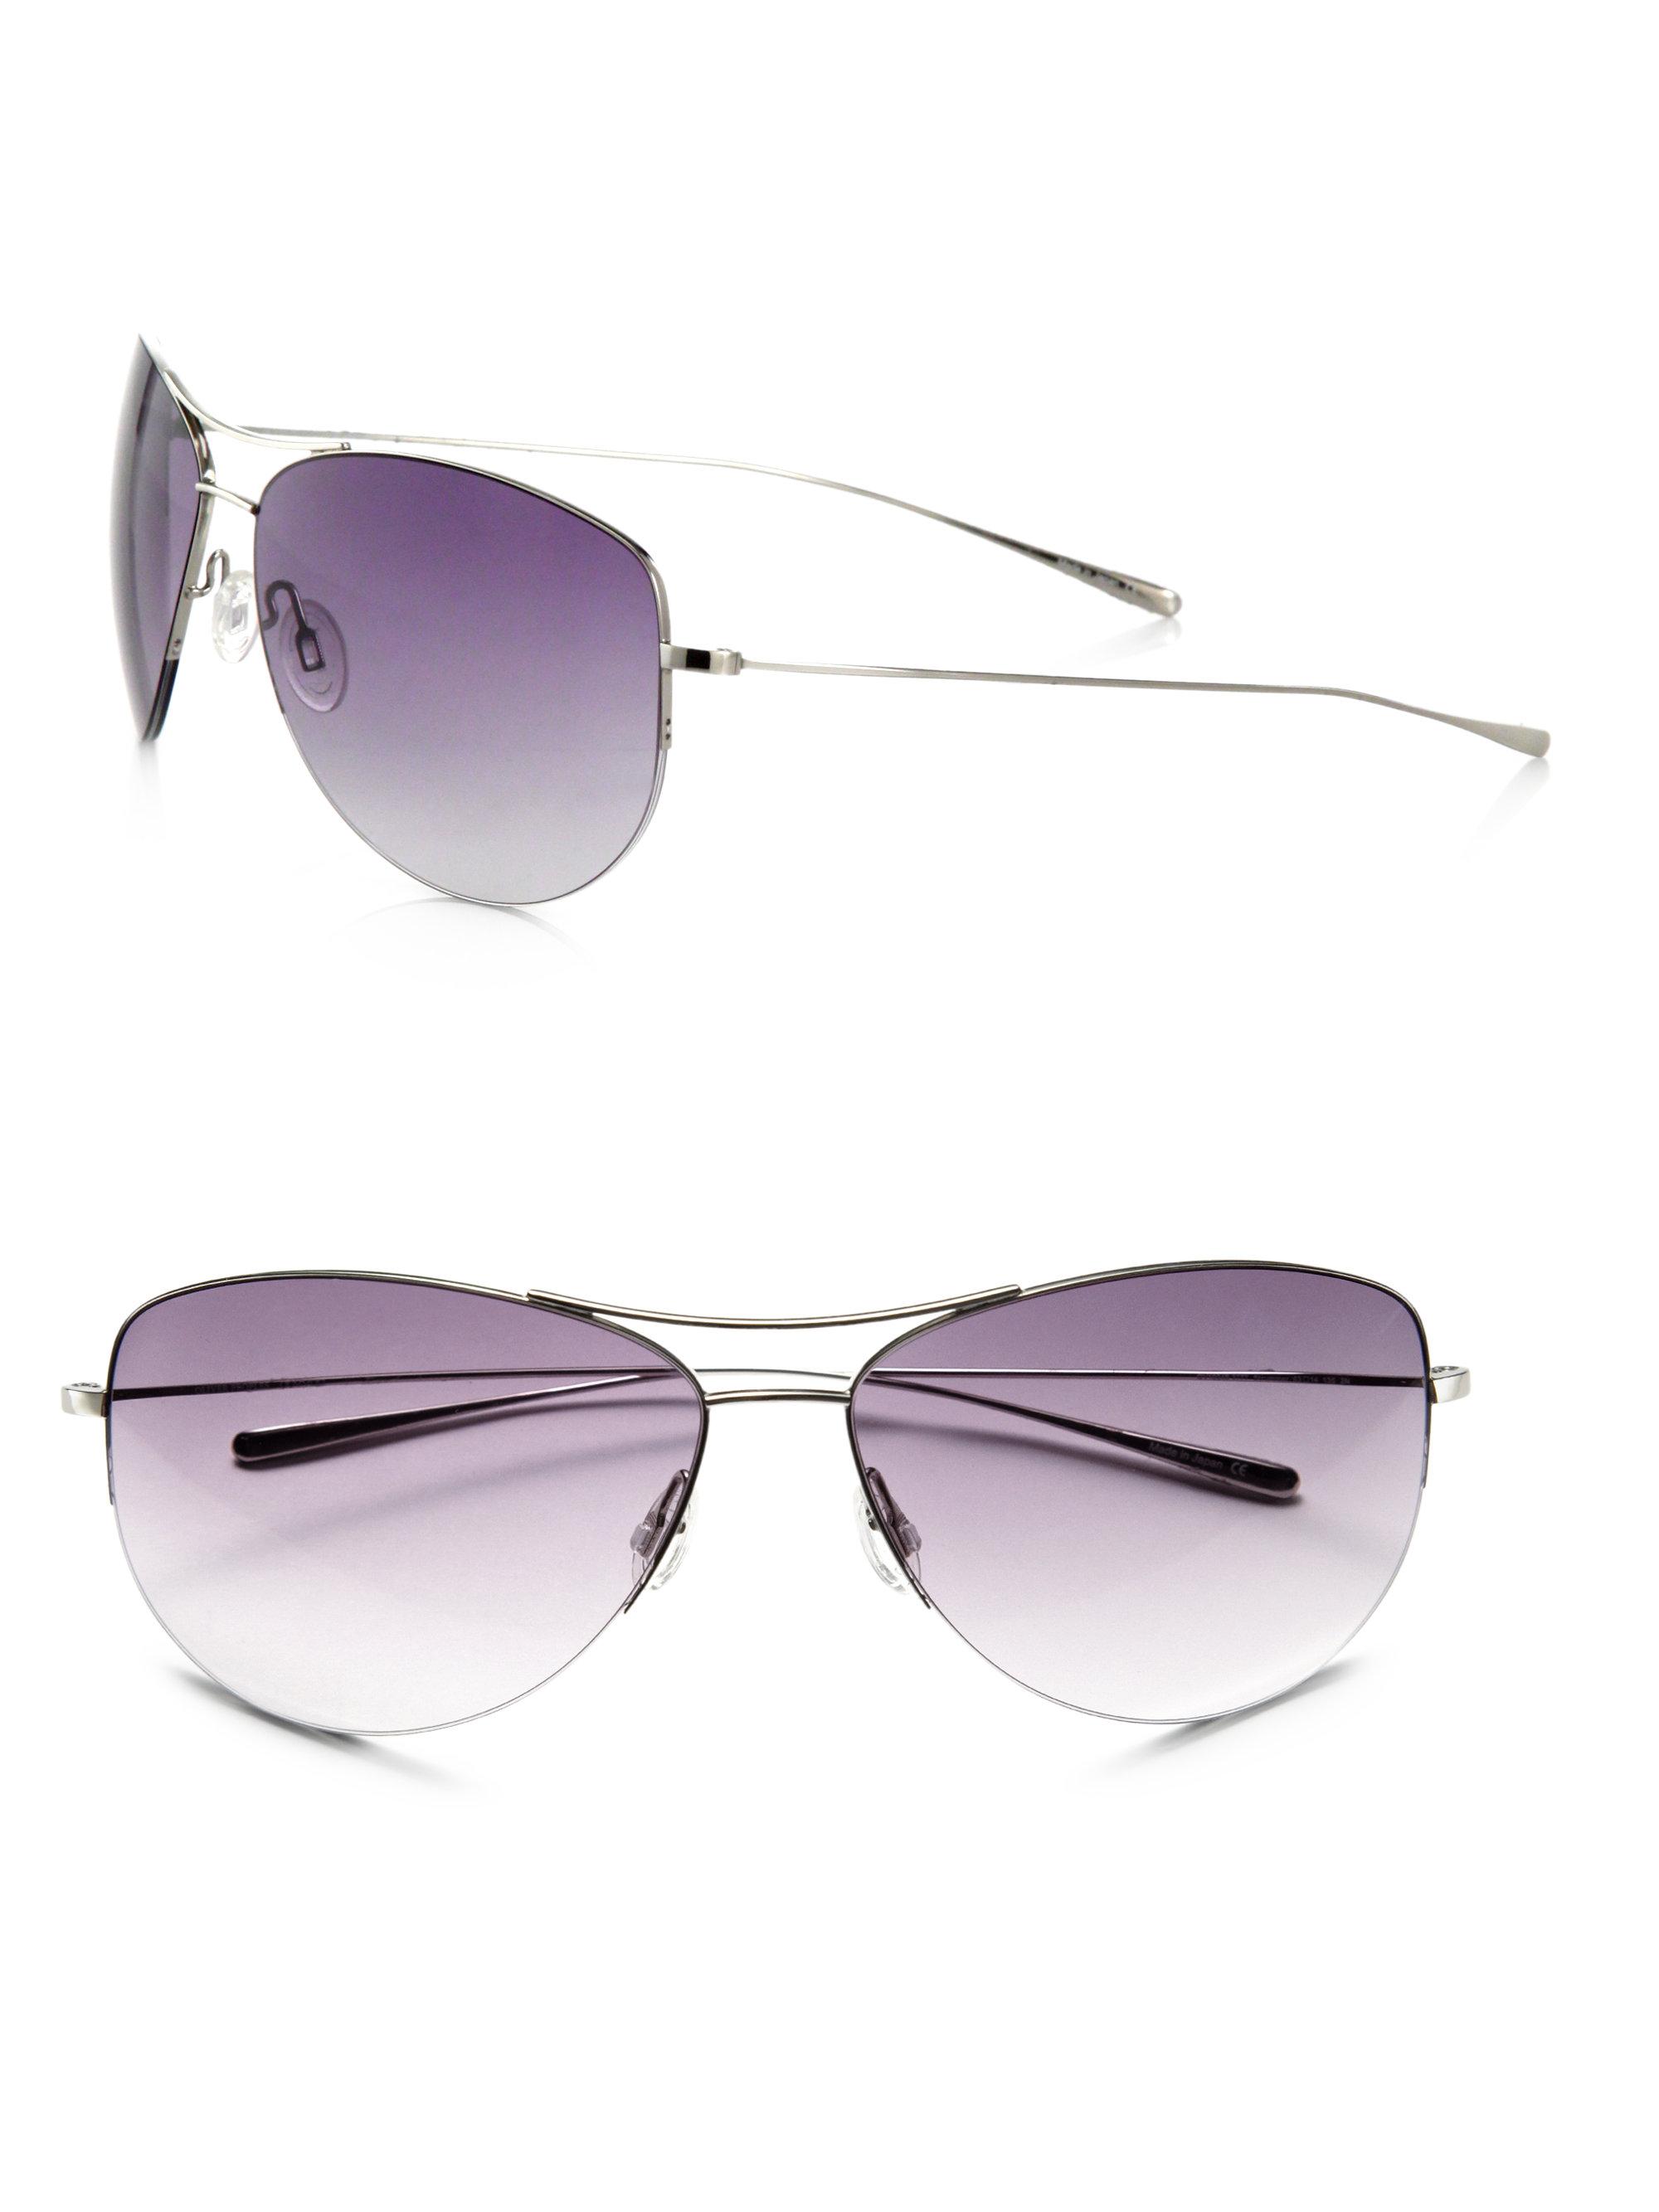 13628efb09f8b Oliver Peoples Strummer Metal Sunglasses in Purple - Lyst